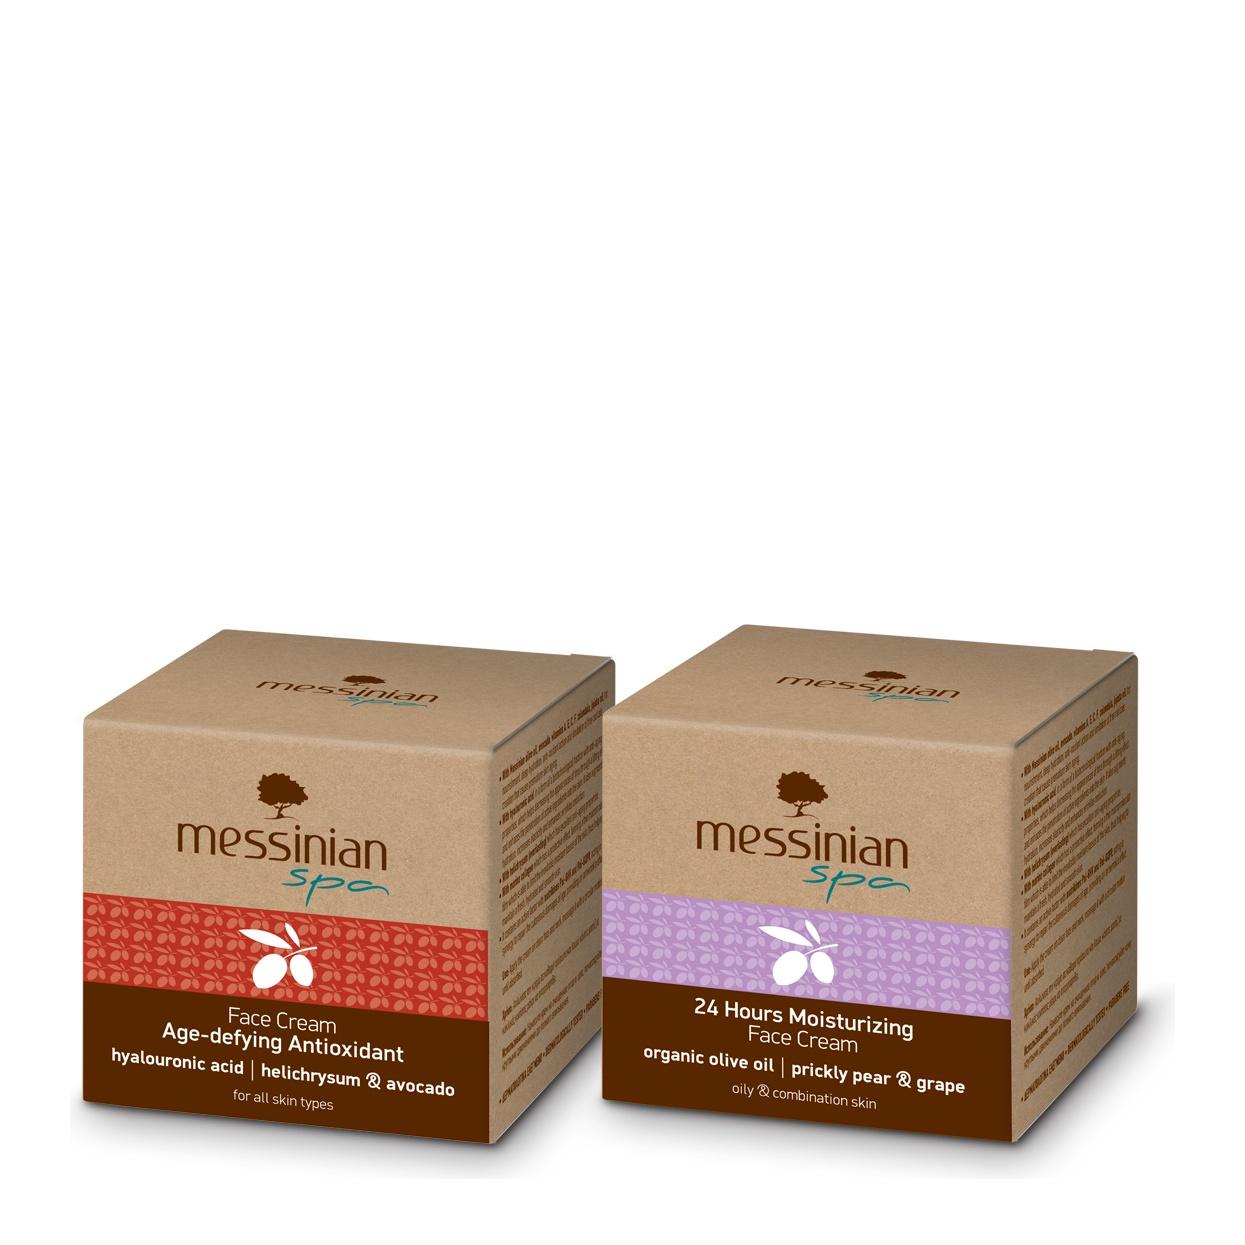 Messinian Spa Anti-Aging Face Cream 50ml &  24h Μoisturizing Face Cream Prickly Pear-Grape for Oily-Combination Skin 50ml